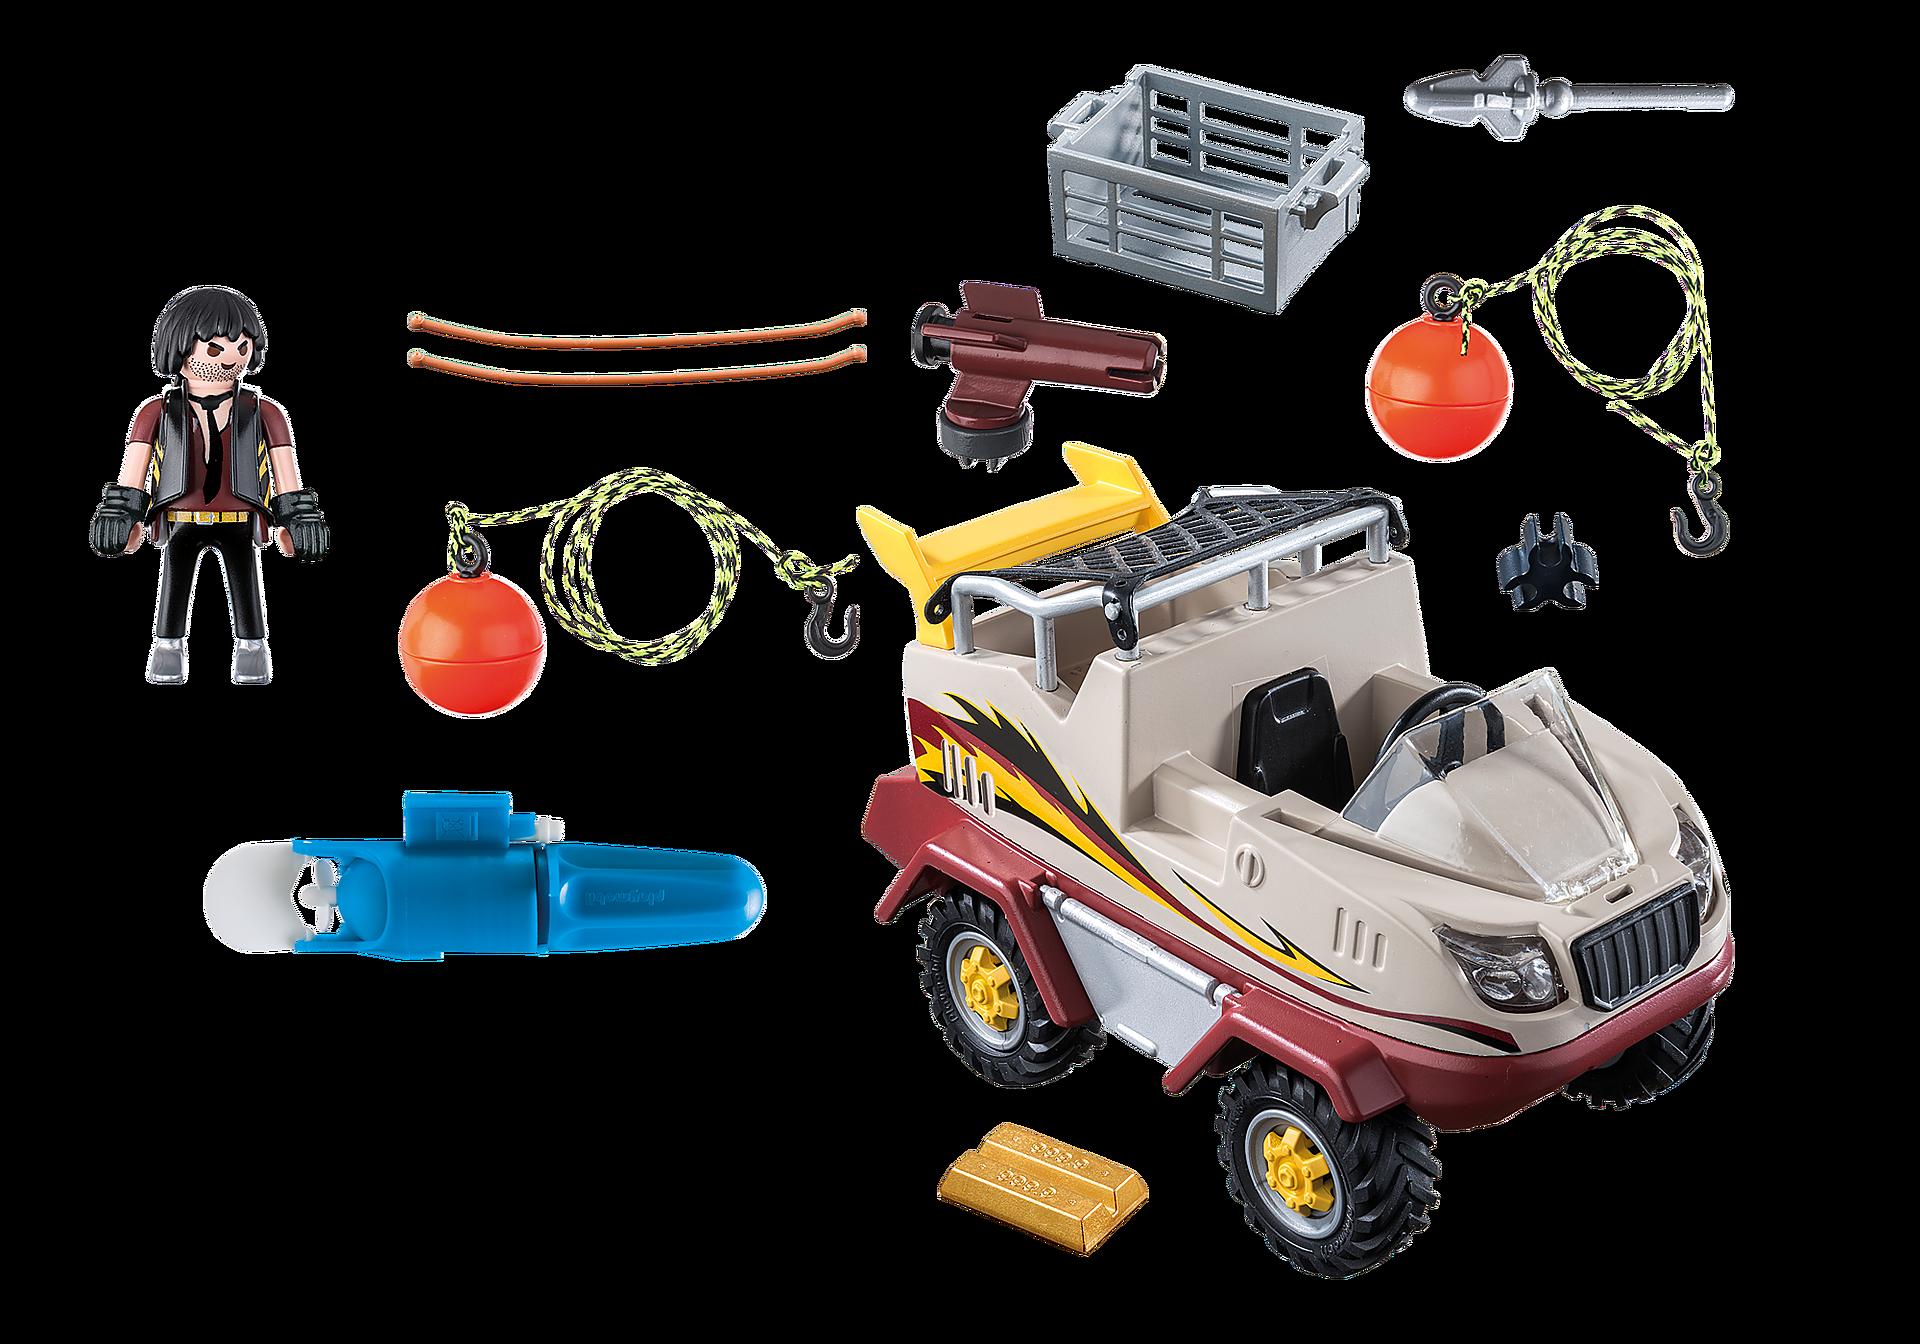 http://media.playmobil.com/i/playmobil/9364_product_box_back/Αμφίβιο όχημα Ομάδας Ειδικών Αποστολών